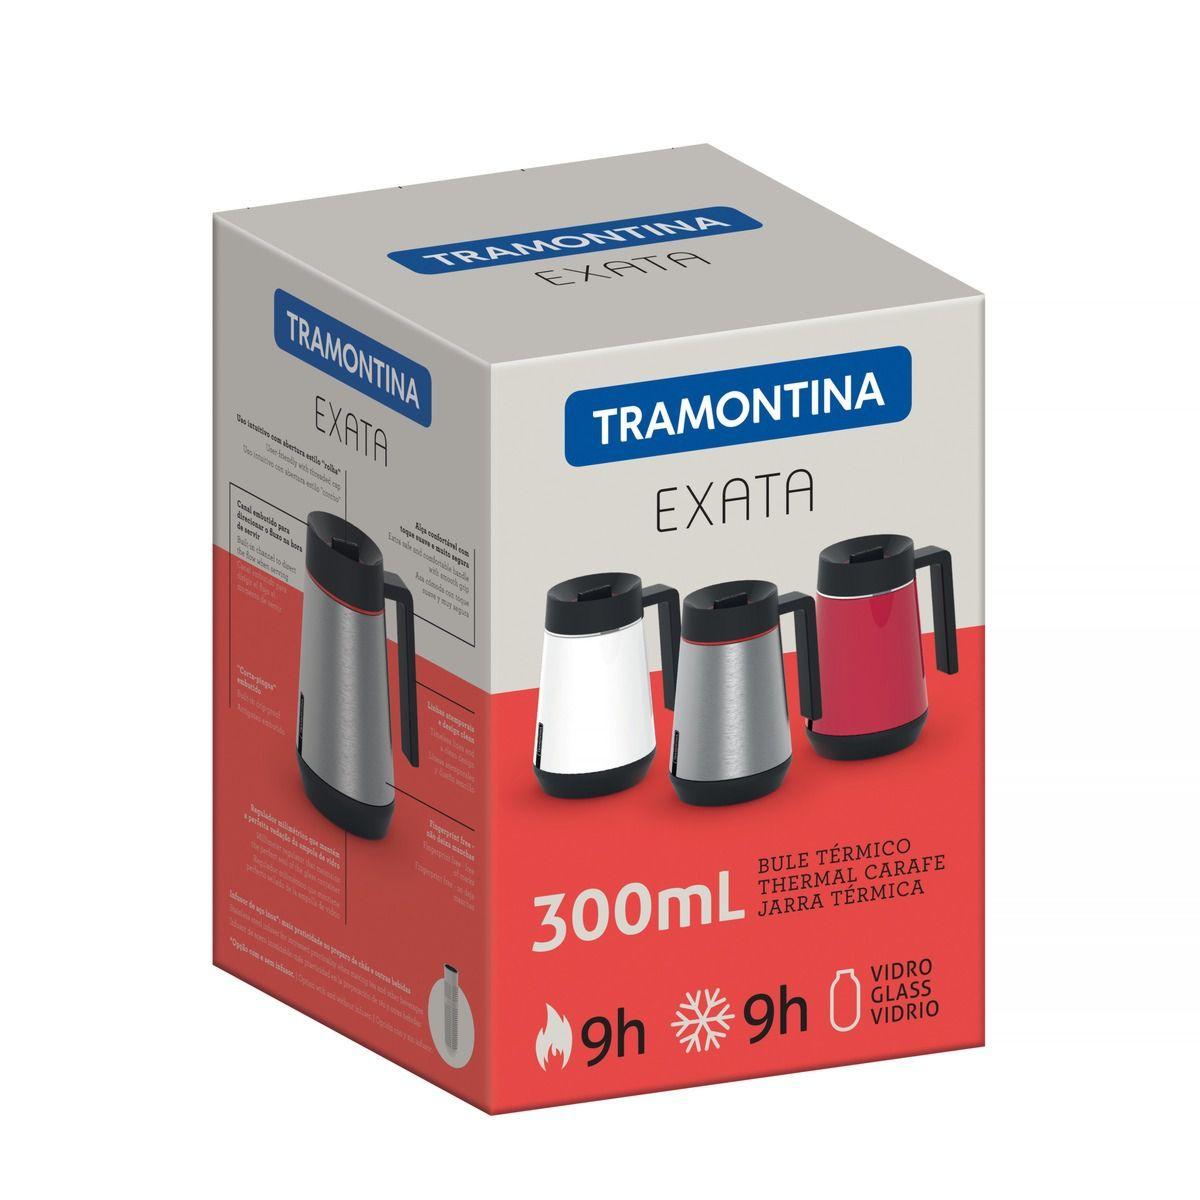 Bule Térmico 300ml Exata sem Infusor VM 61645/036 Tramontina